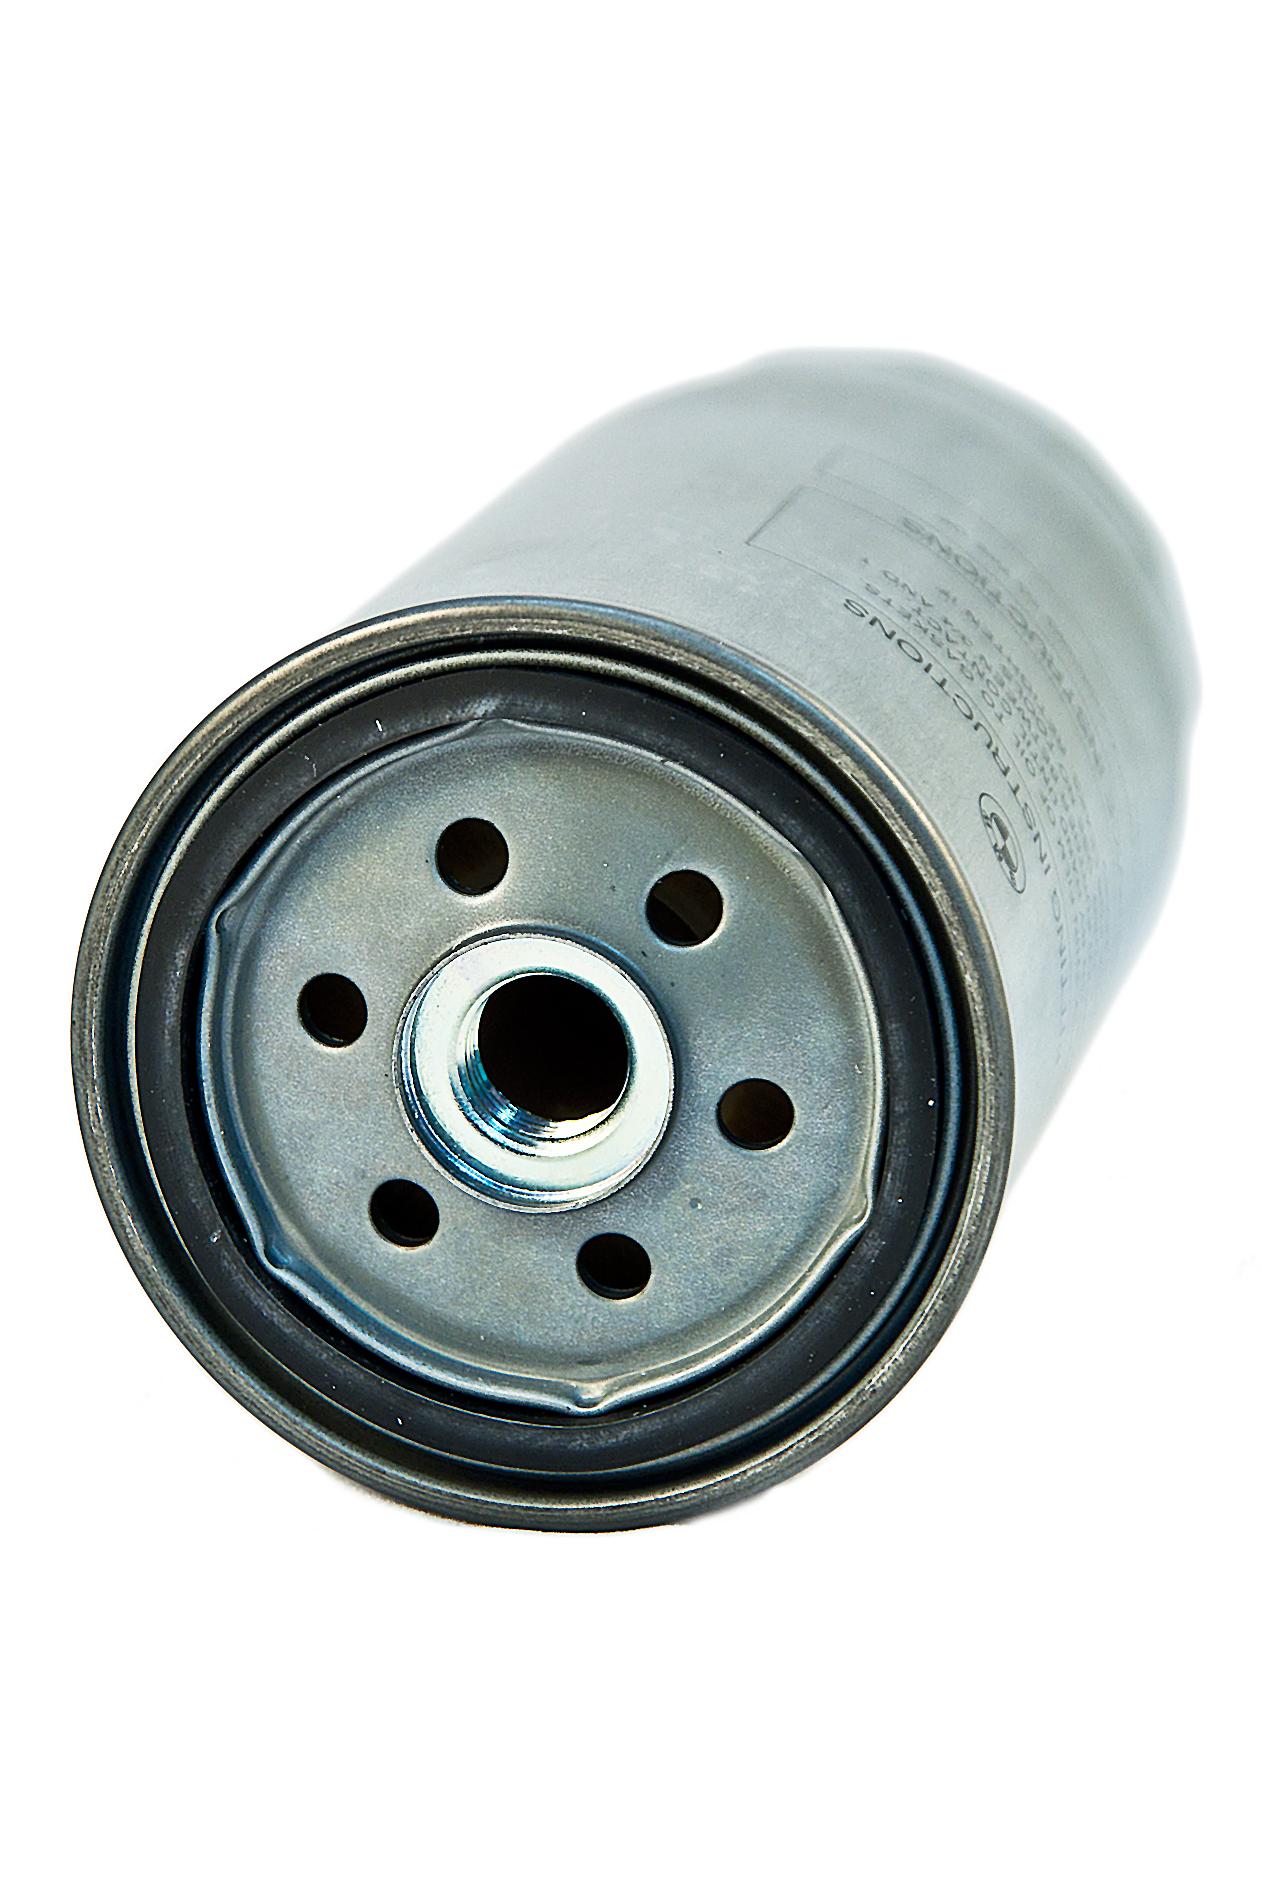 hight resolution of bmw genuine fuel filter cartridge element e36 e39 3 5 series diesel 13327786647